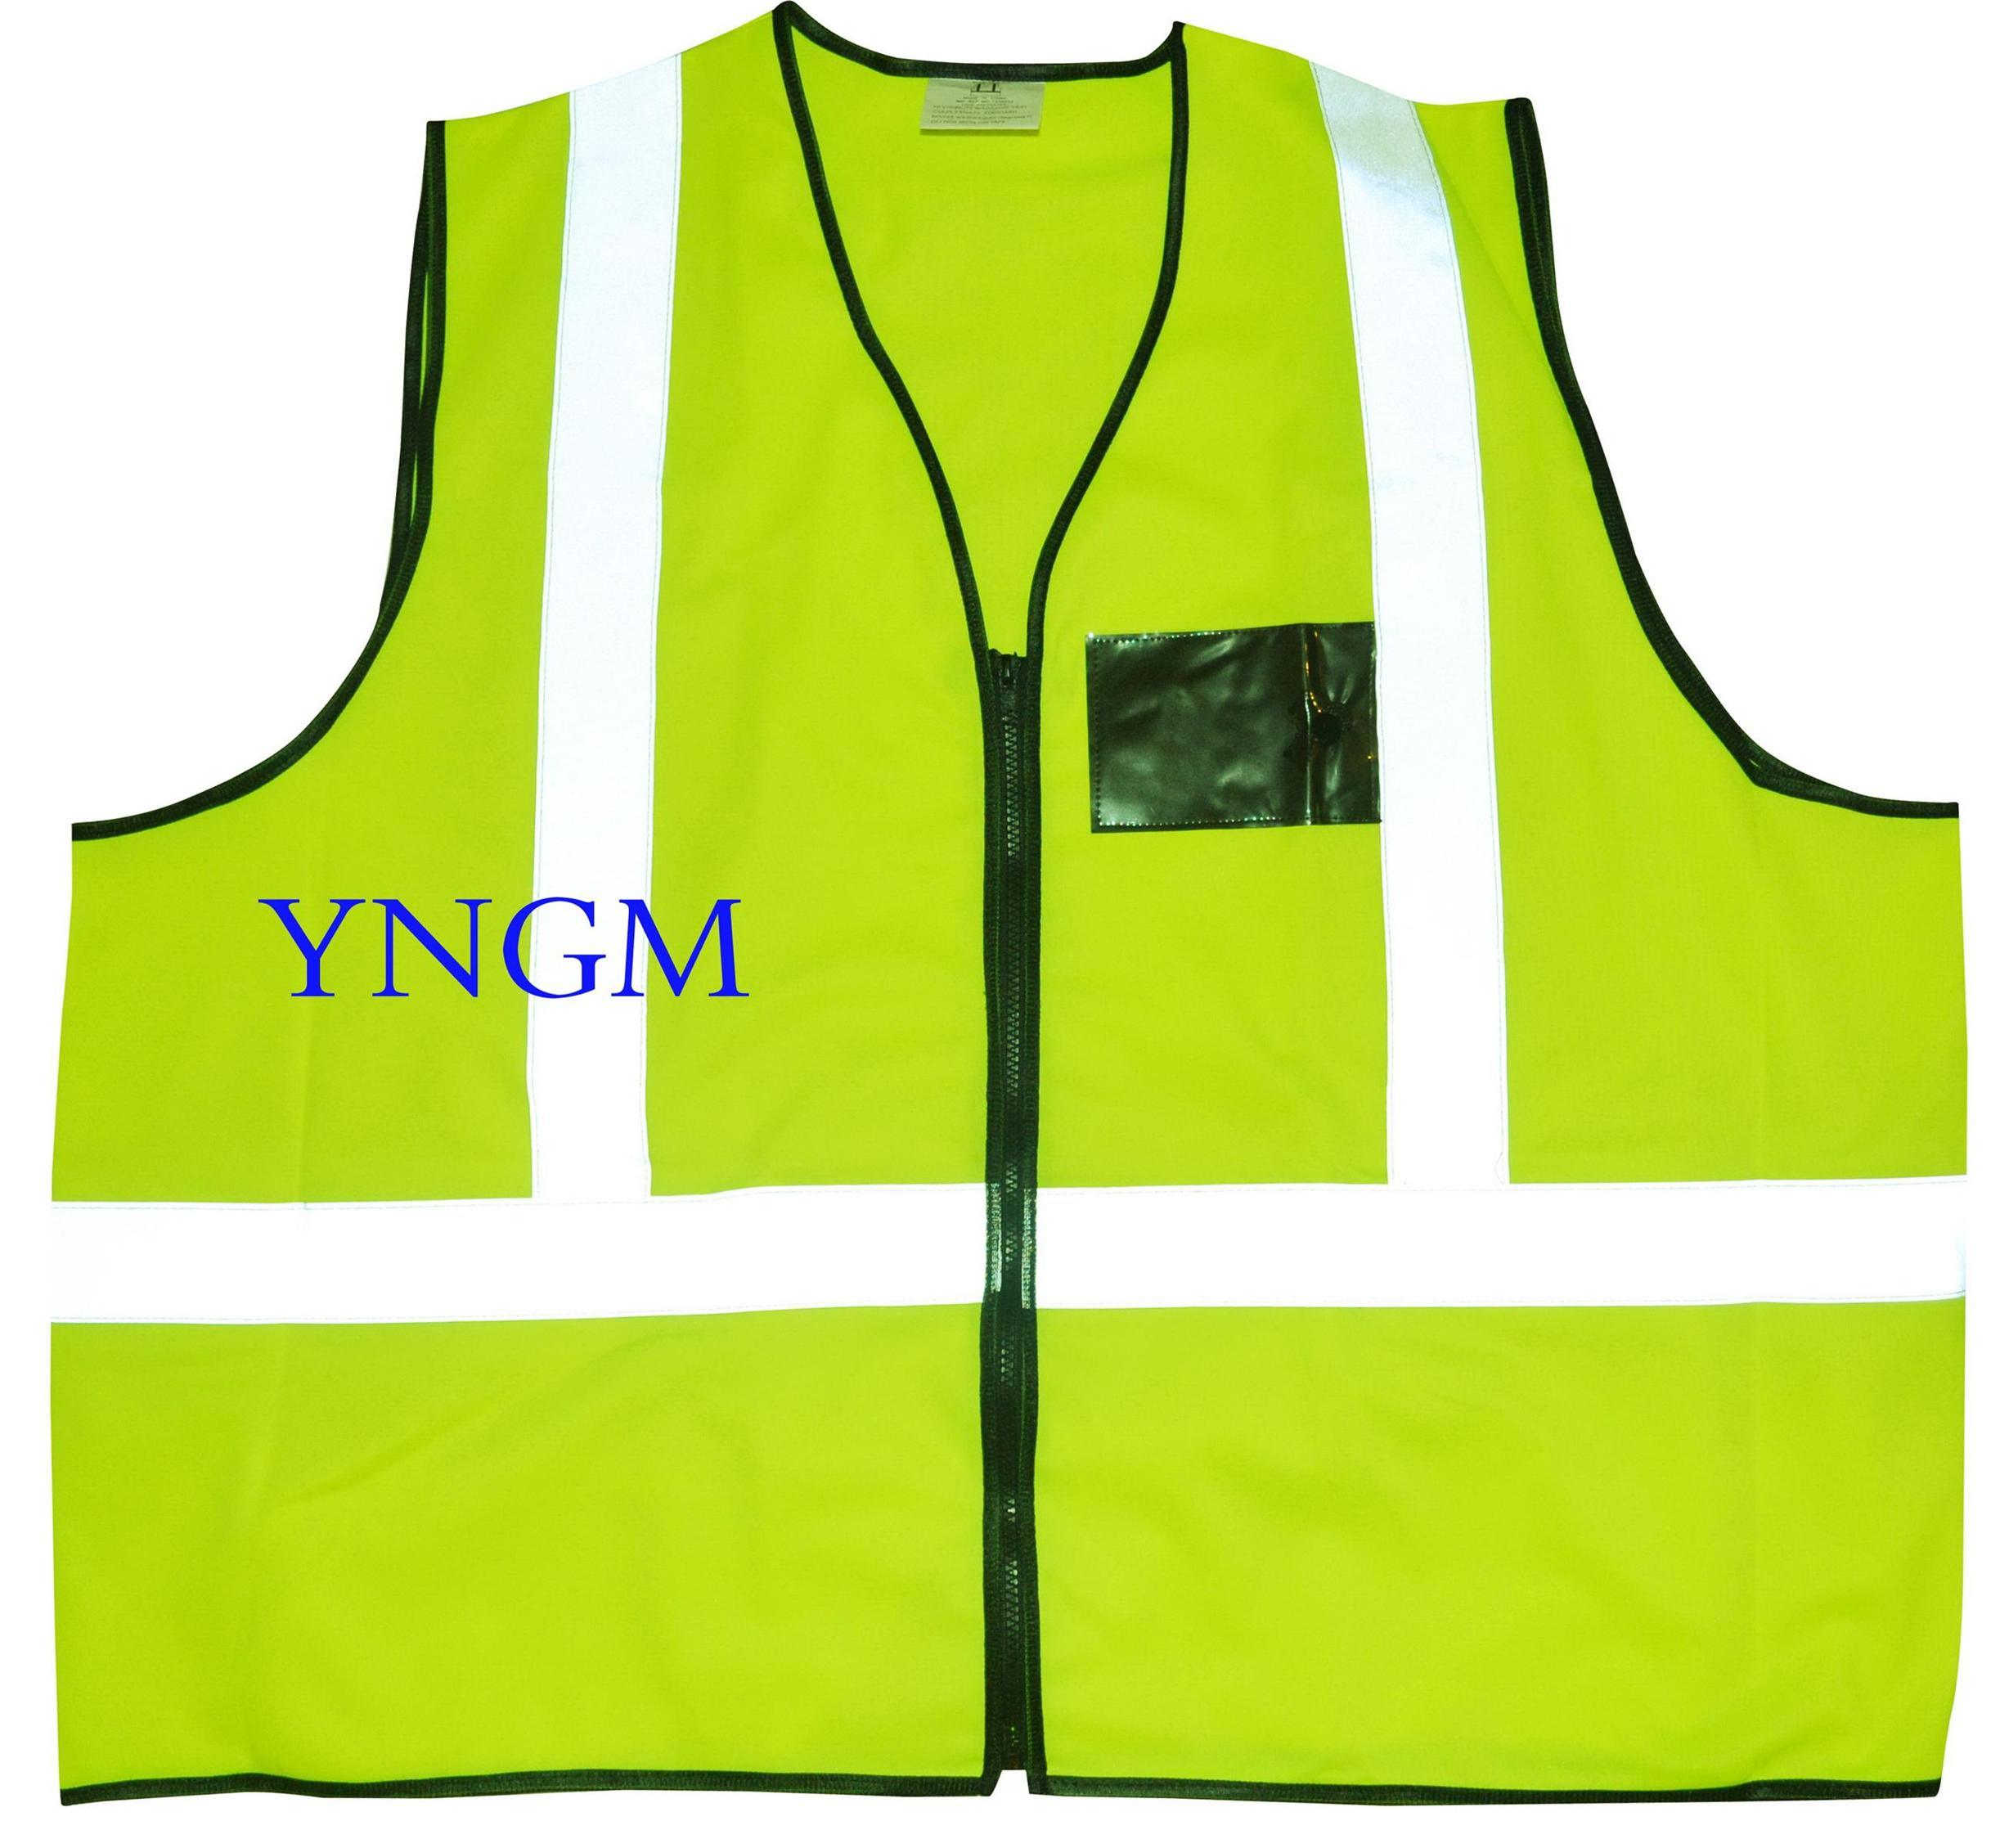 Hot Sale En20471 & ANSI High Visibility Class 2 Reflective Safety Vest